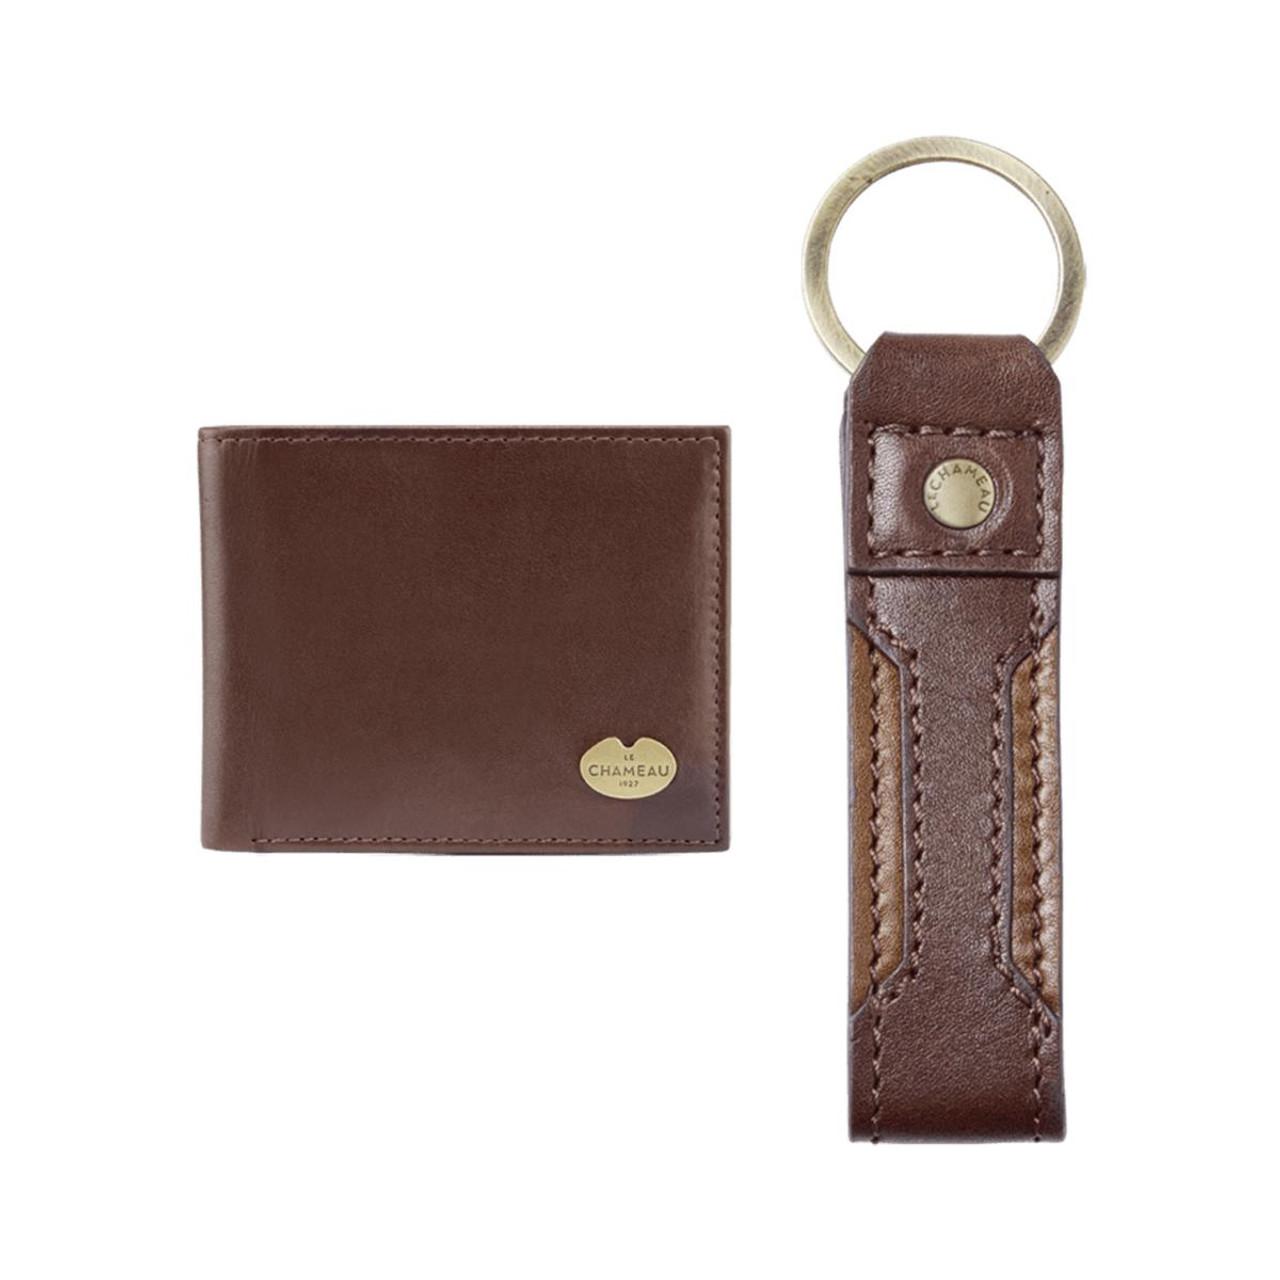 Marron Fonce Le Chameau Leather Jameson Key Ring & Bifold Wallet Gift Set